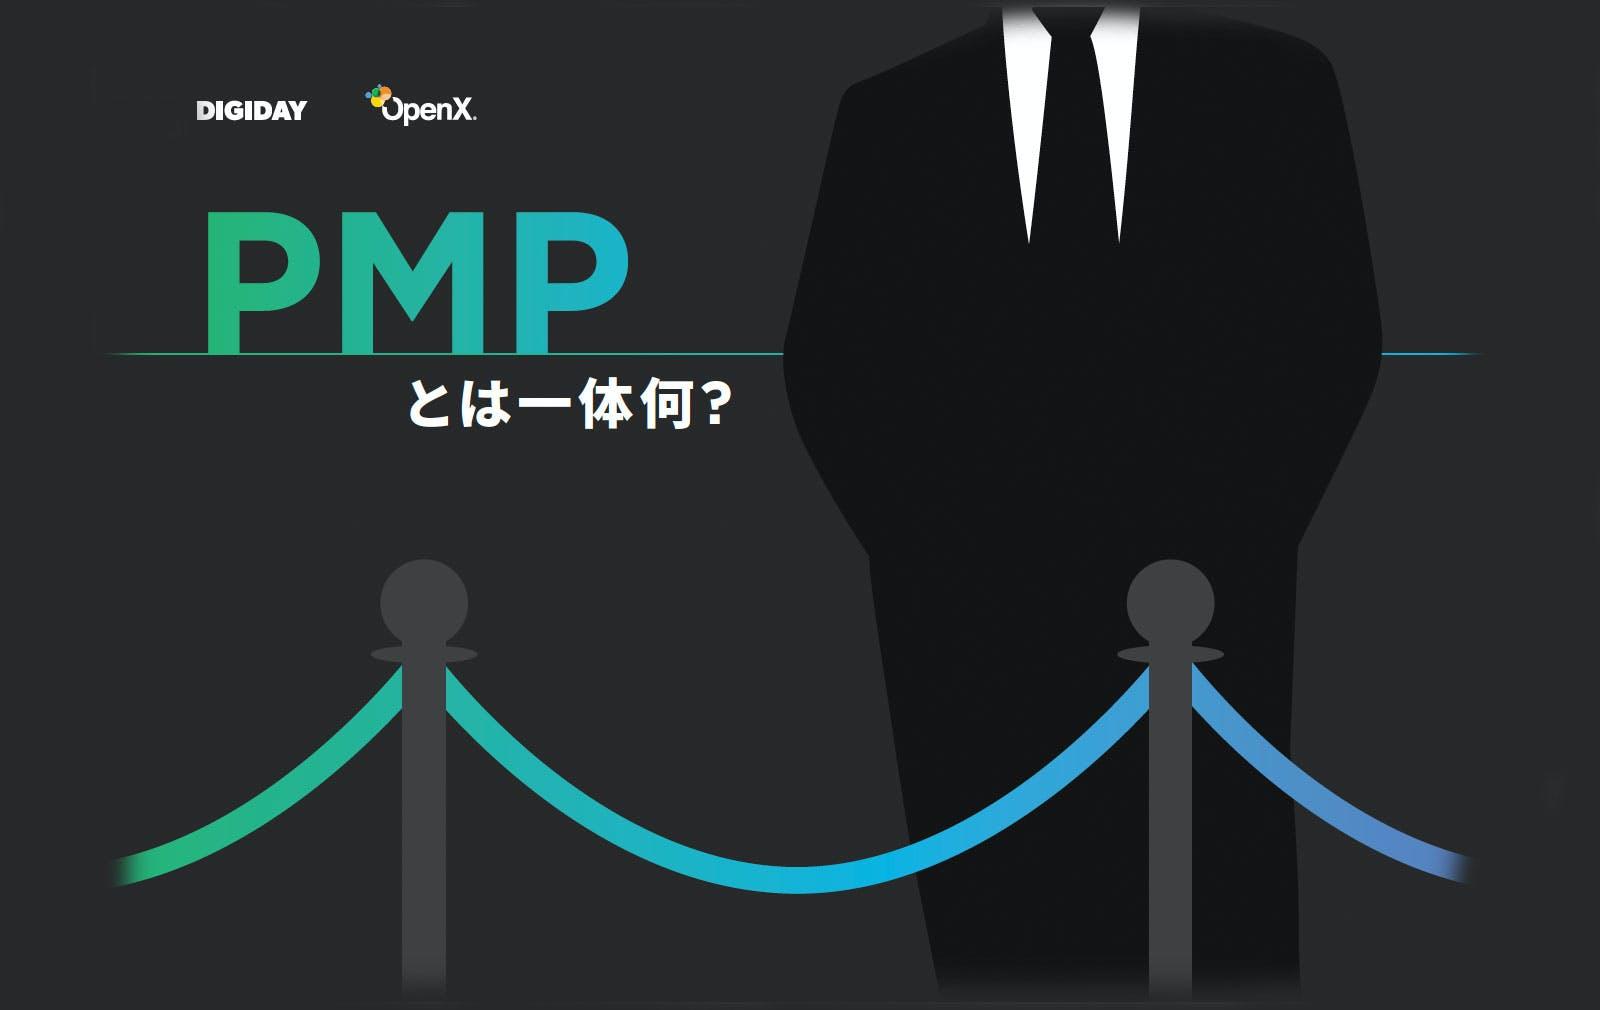 WTF PMP JP FeatImg - OpenX プログラマティックダイレクト:RTG